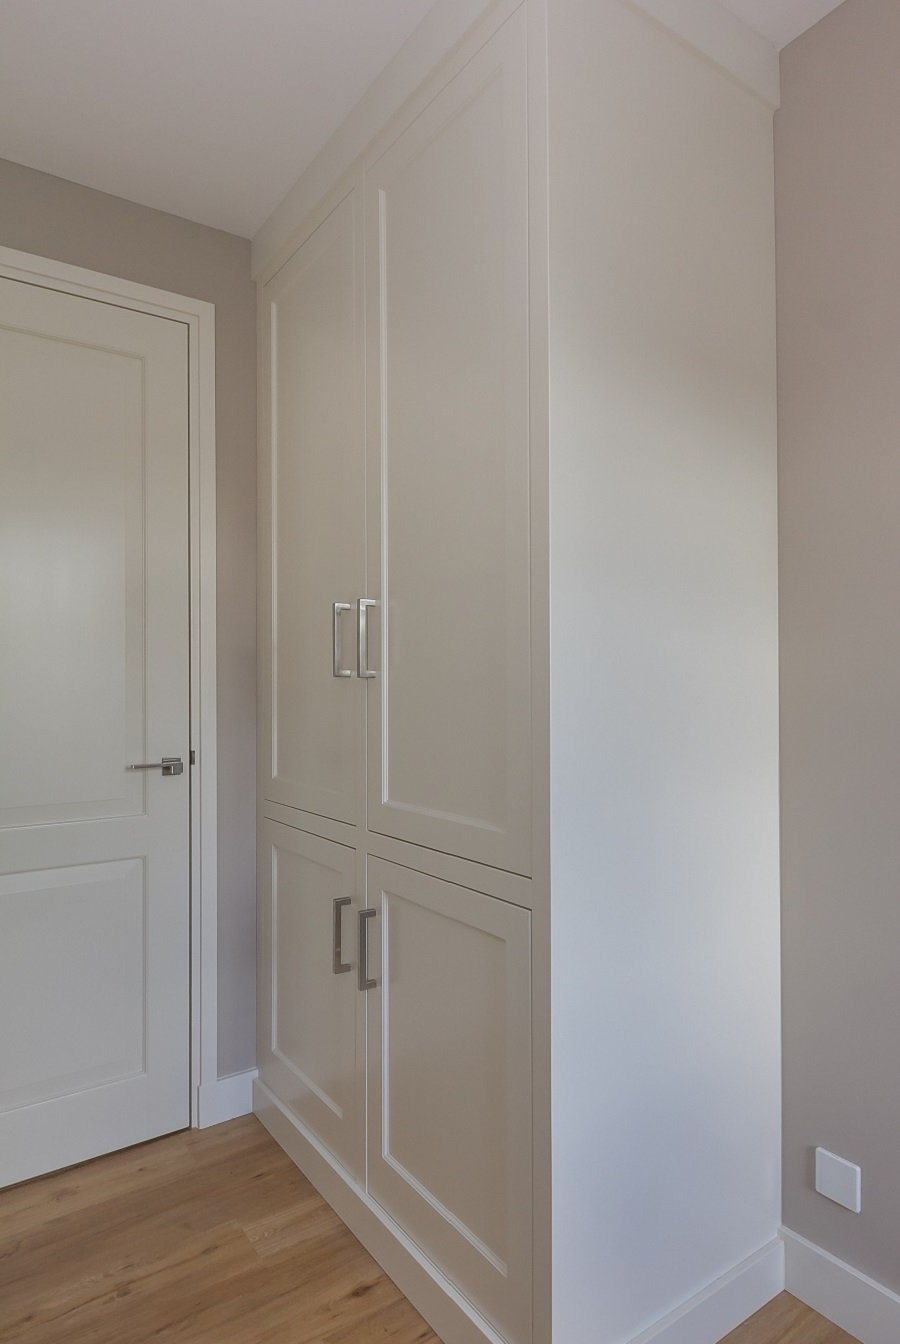 Interieur complete inrichting - Elon Vloer & Interieur